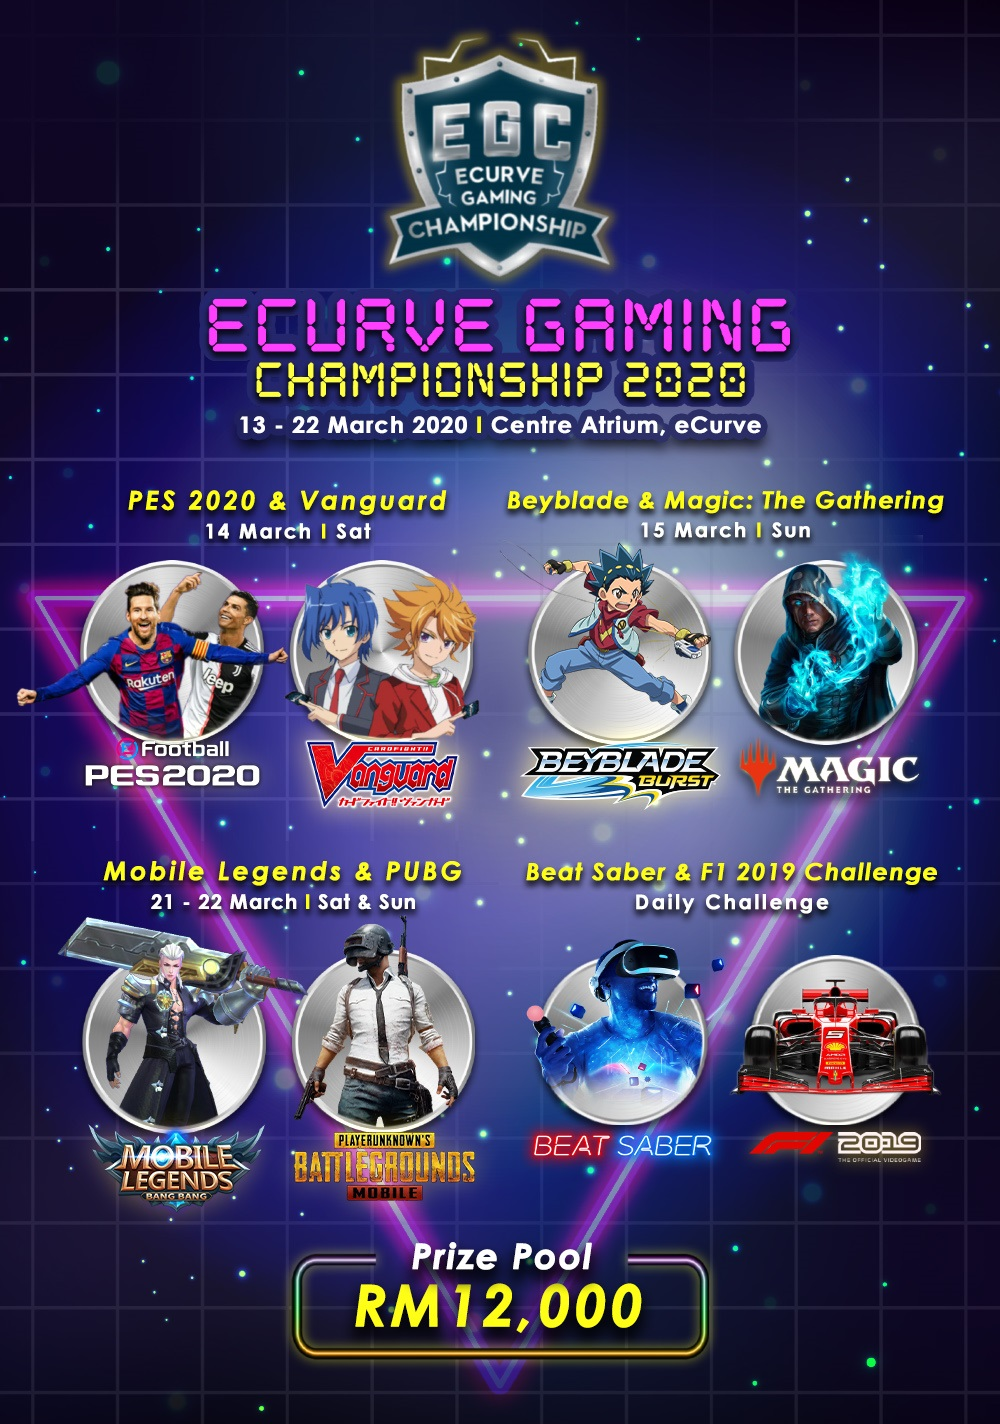 eCurve Gaming Championship